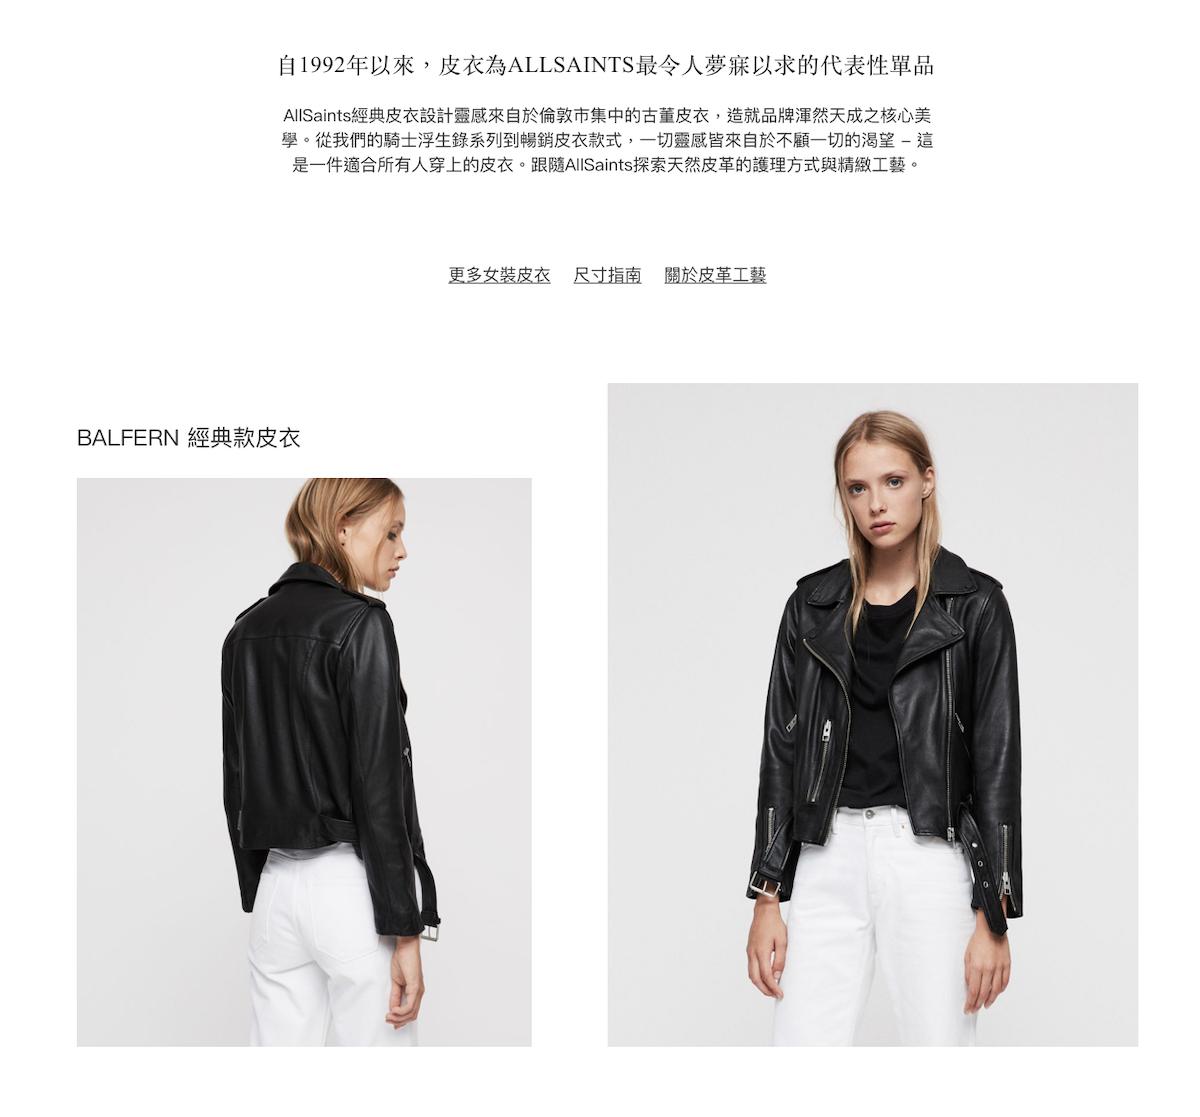 allsaints-code-discount-皮衣-夾克-騎士皮衣-靴子-特價-網購-時尚-免運費-運費-尺寸-洋裝-包包-關稅-評價-介紹-ptt